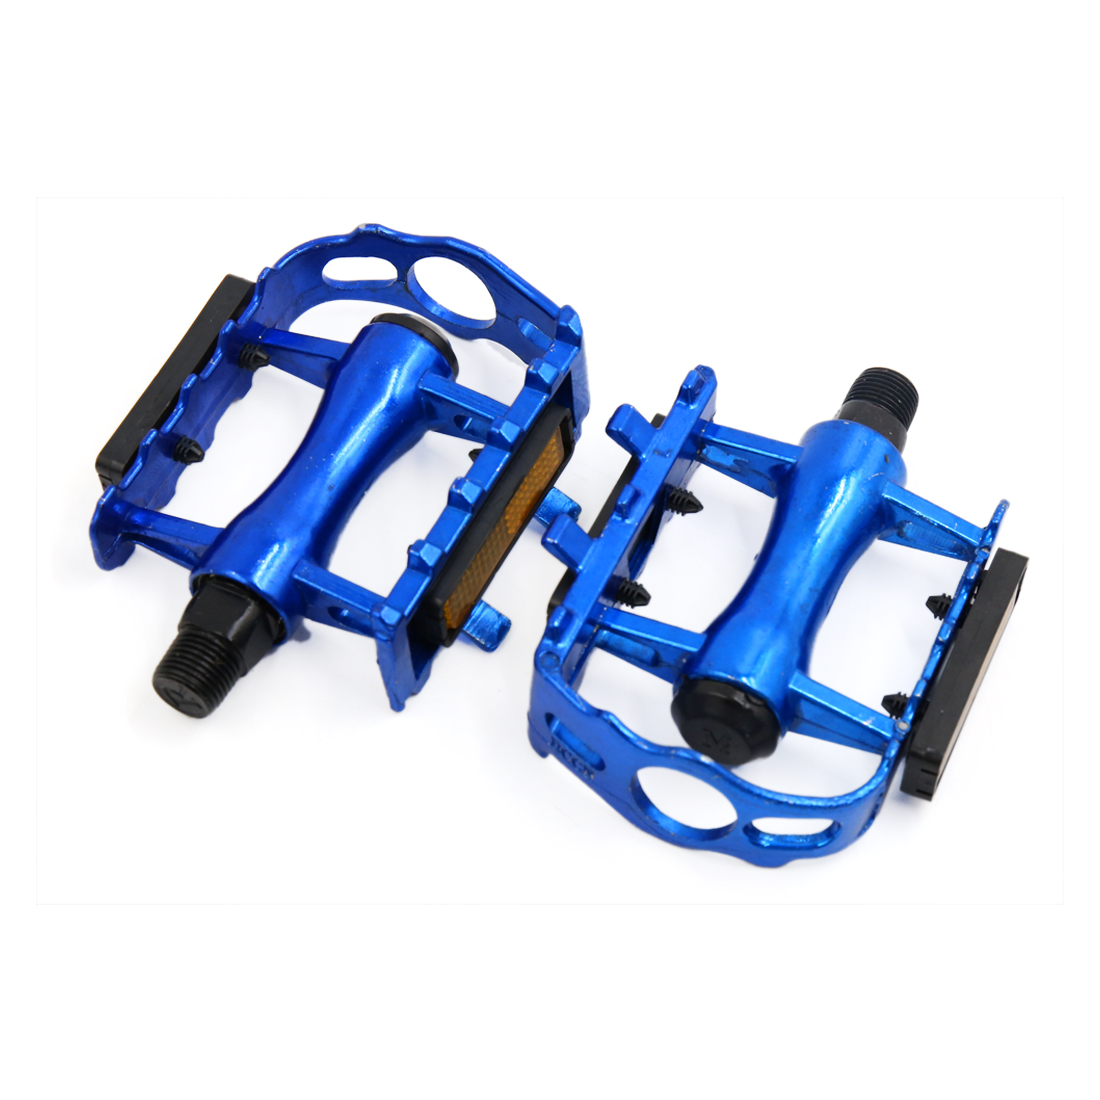 2pcs Bicycle Pedal Cycling Bike MTB Aluminum Alloy Flat Platform Pedals Blue